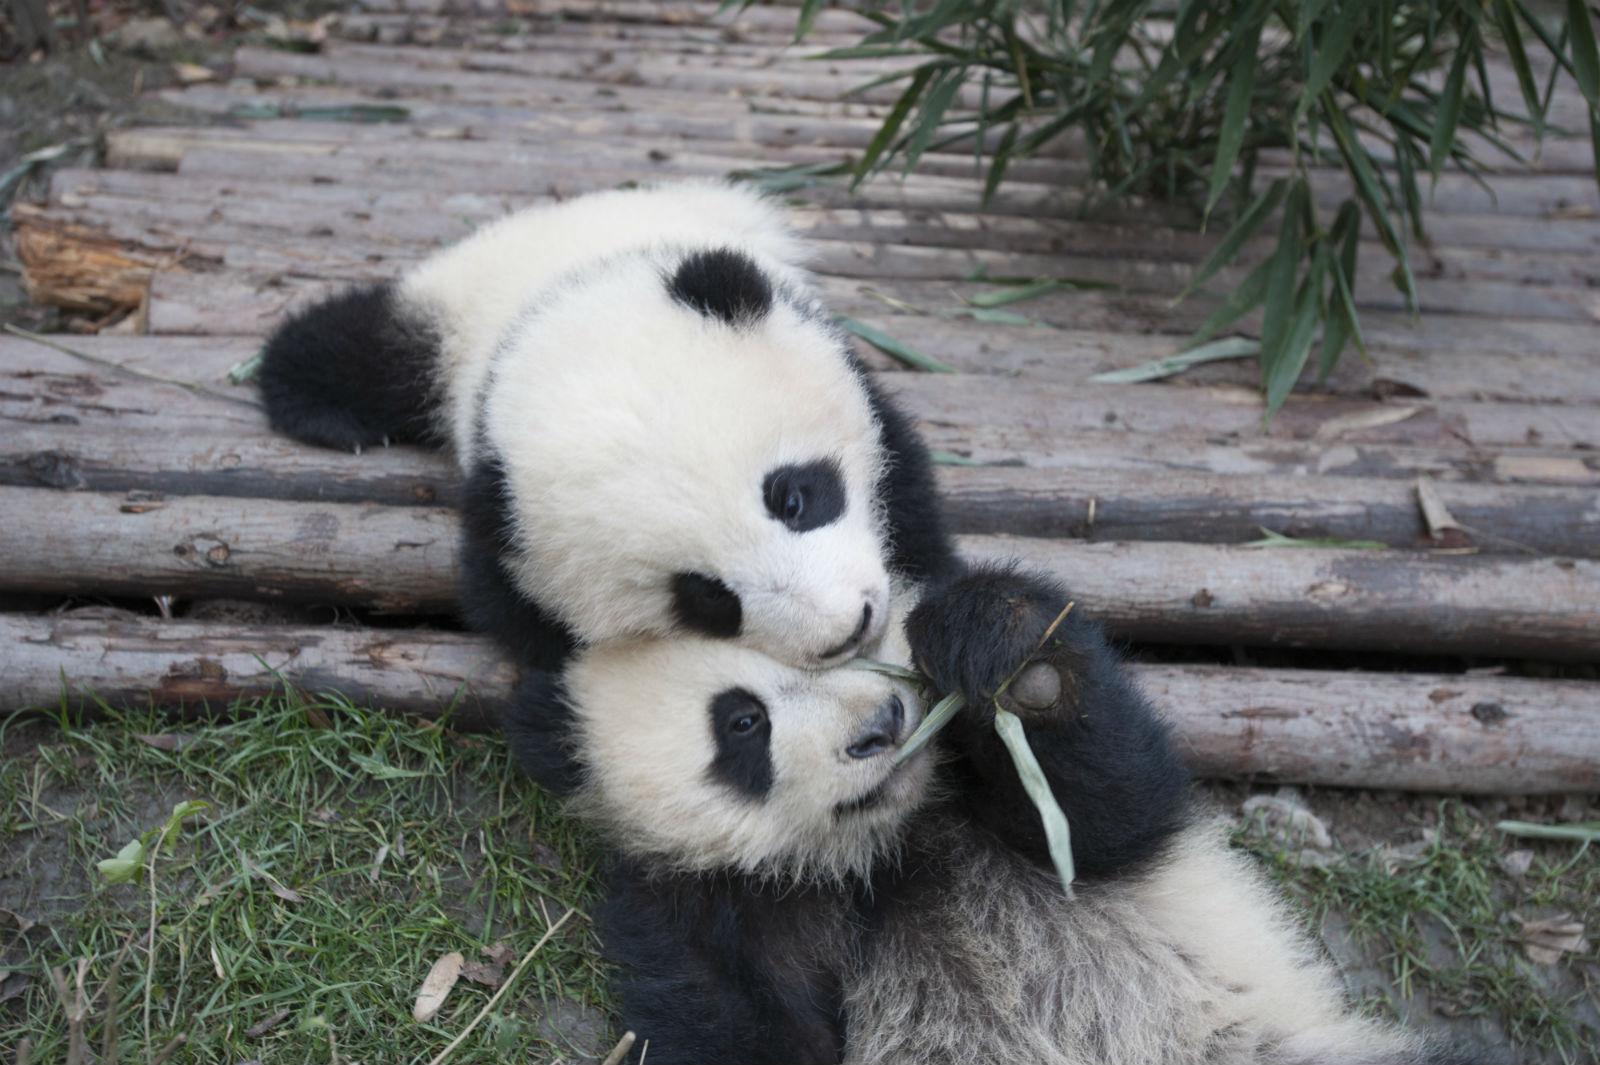 Pandas: more like bears or raccoons?